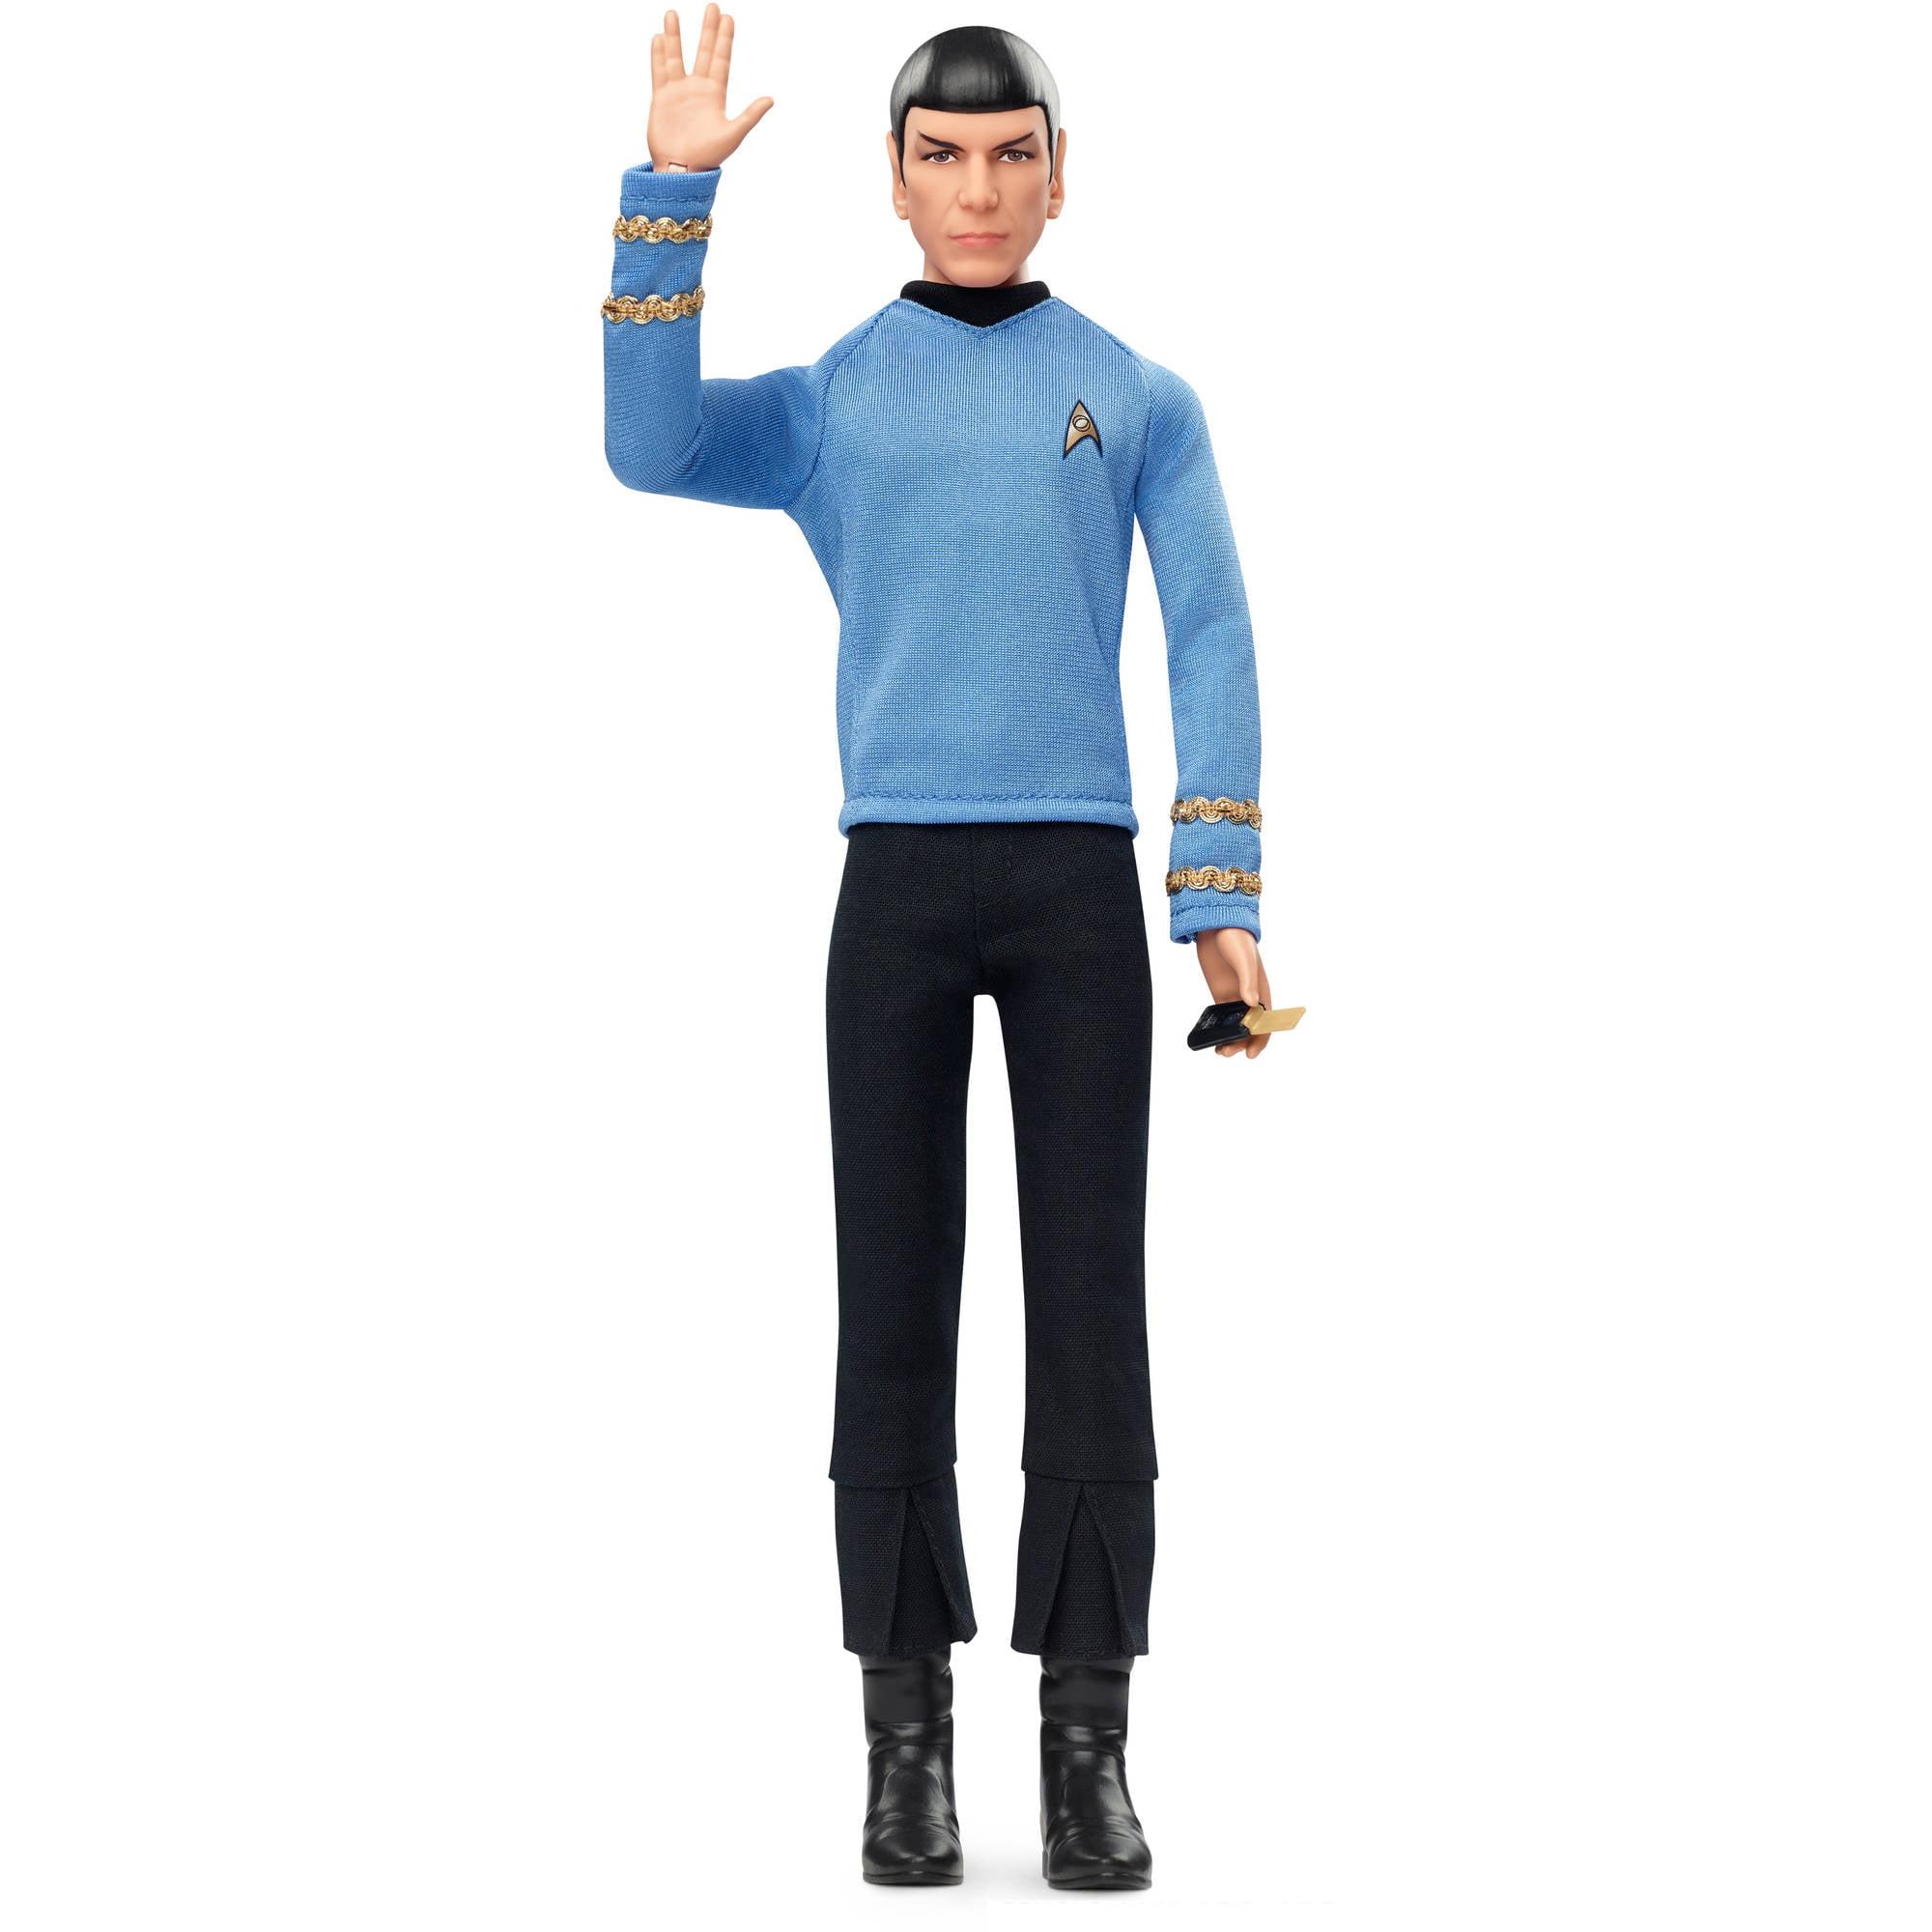 Barbie Star Trek 50th Anniversary Doll, Mr. Spock by MATTEL INC.